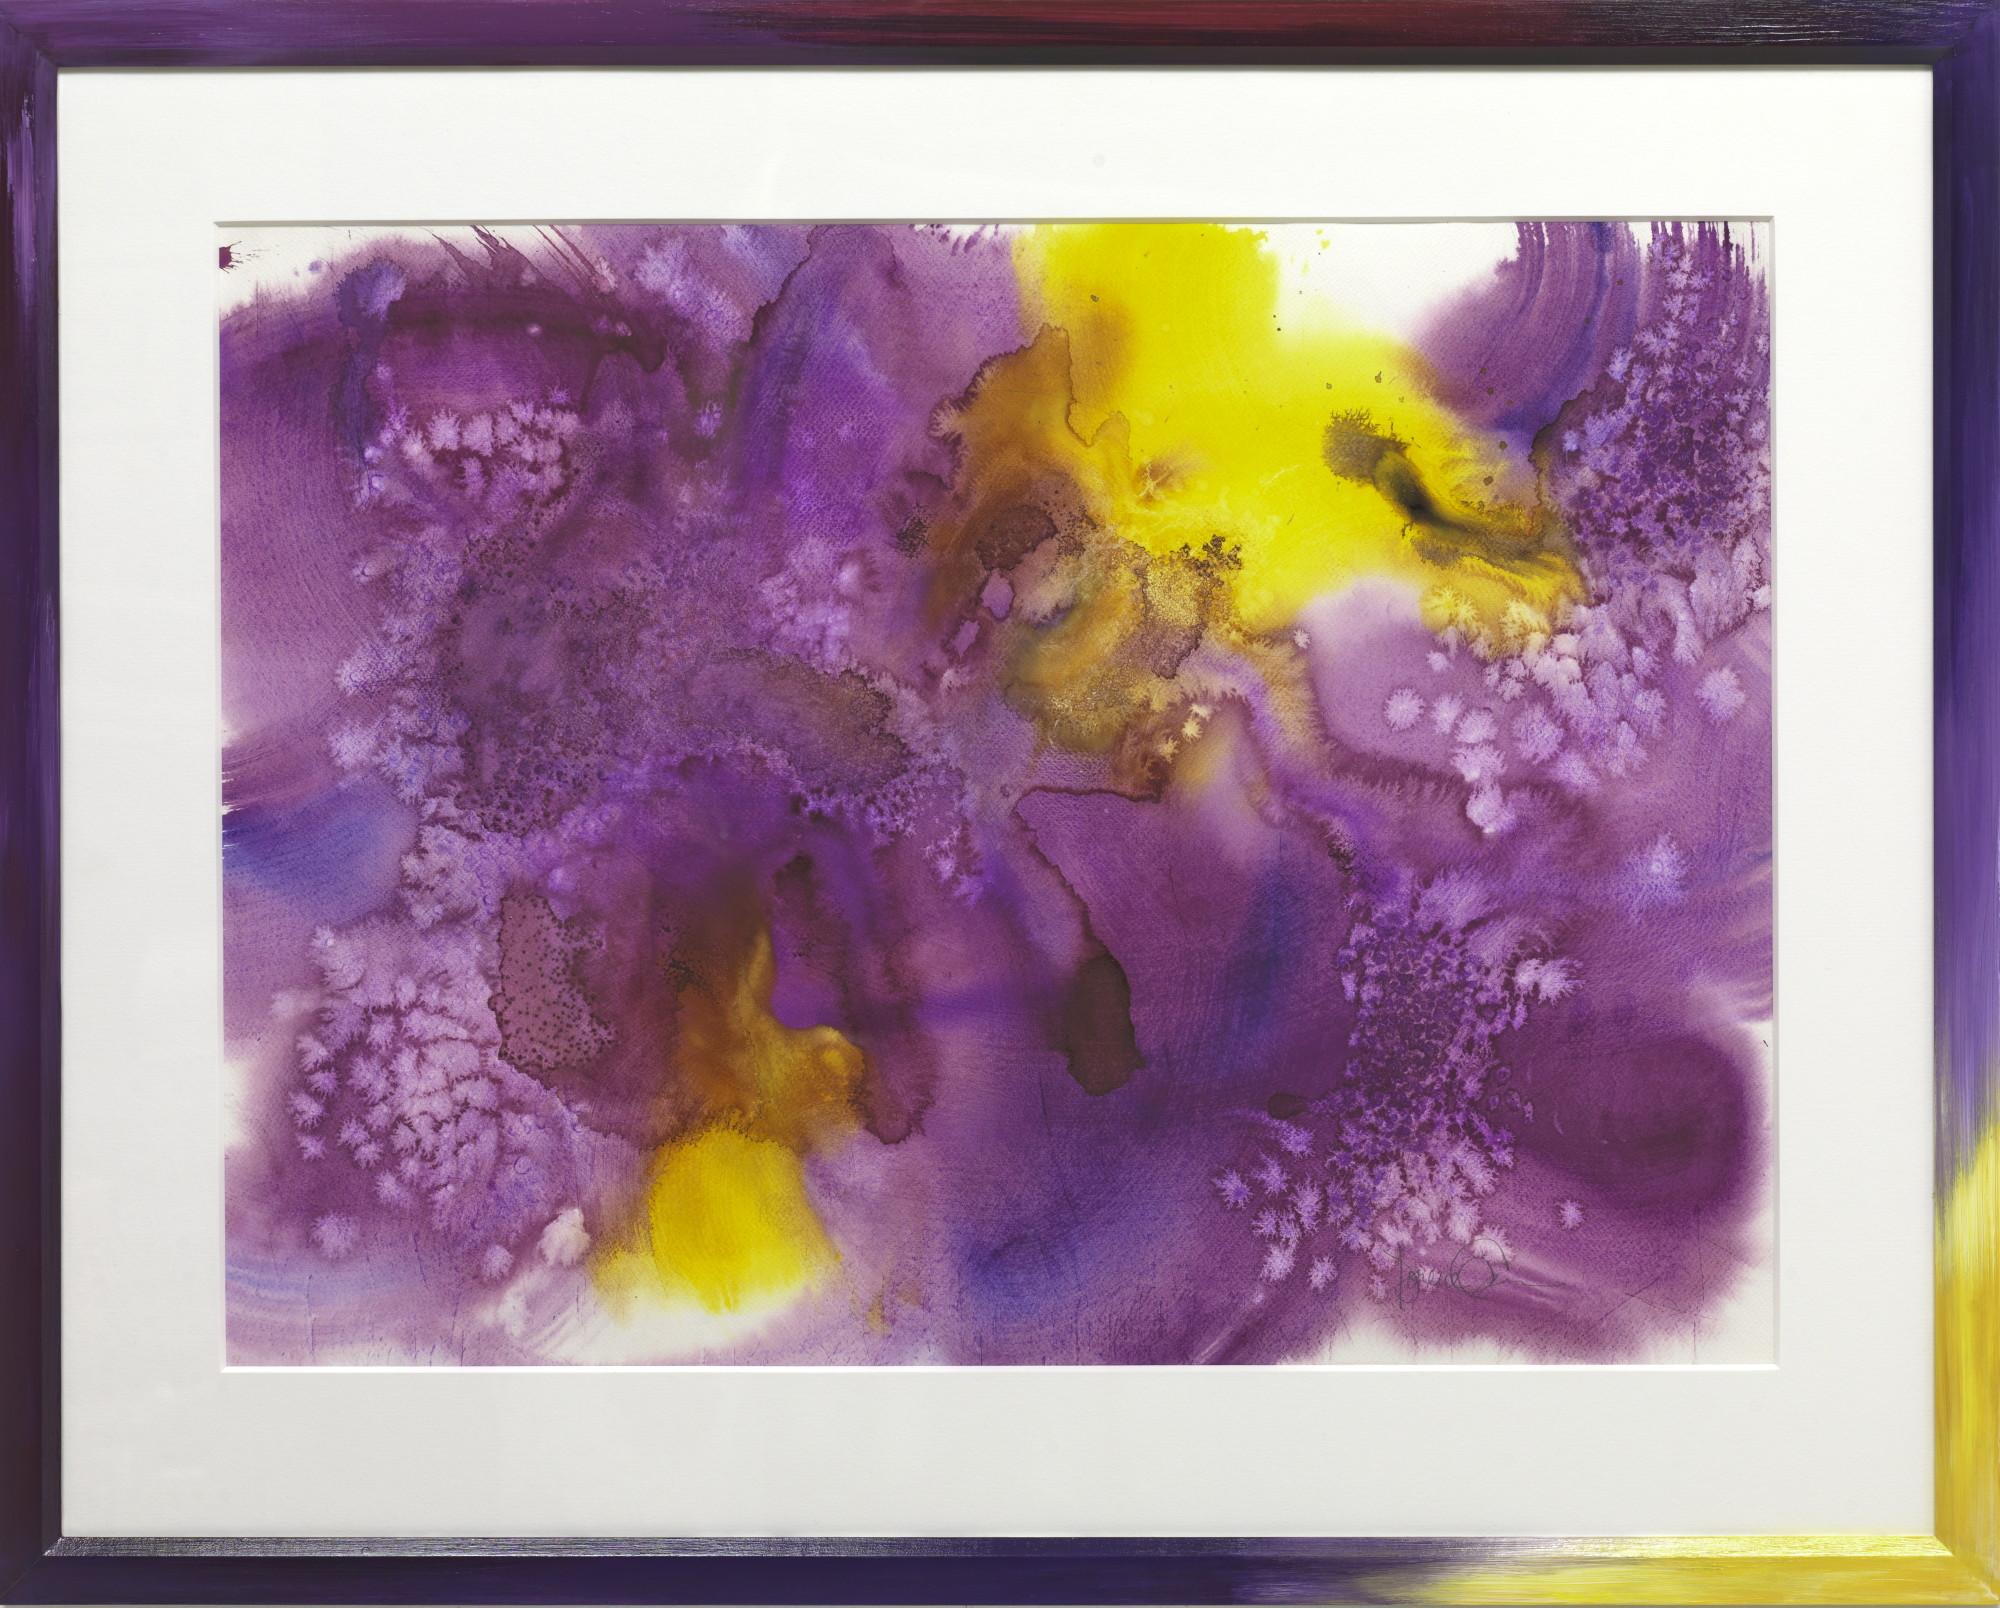 violet intensityFLOWER_4525053